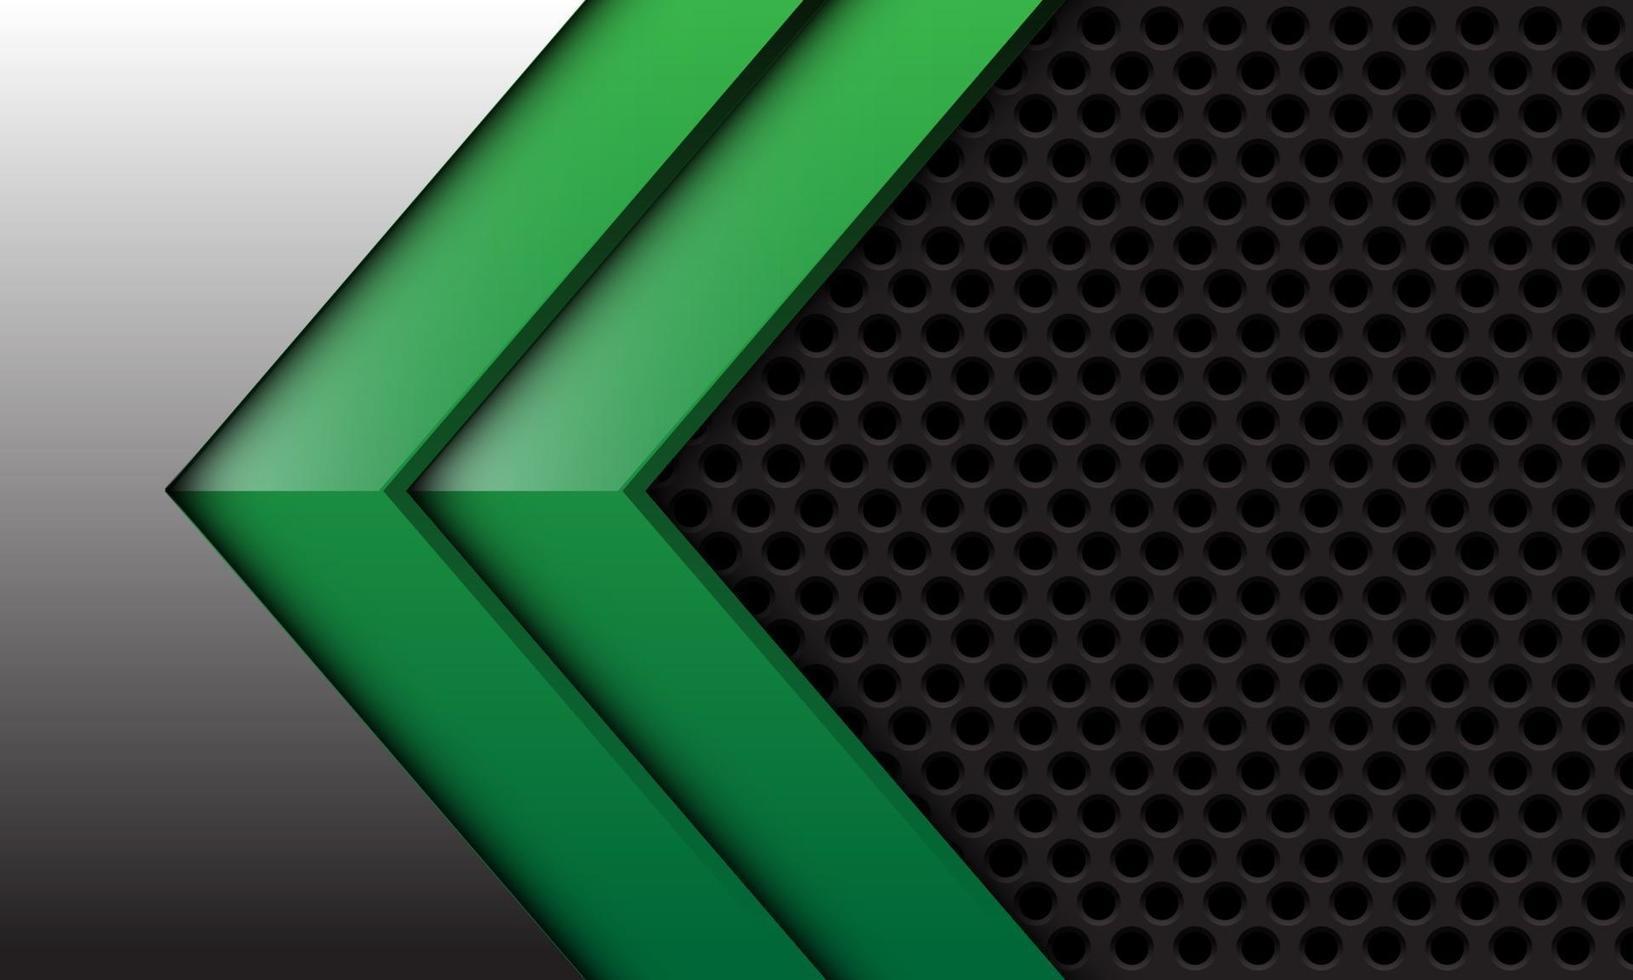 Flecha verde gemela abstracta en plata con diseño de malla de círculo gris oscuro ilustración de vector de fondo futurista moderno.